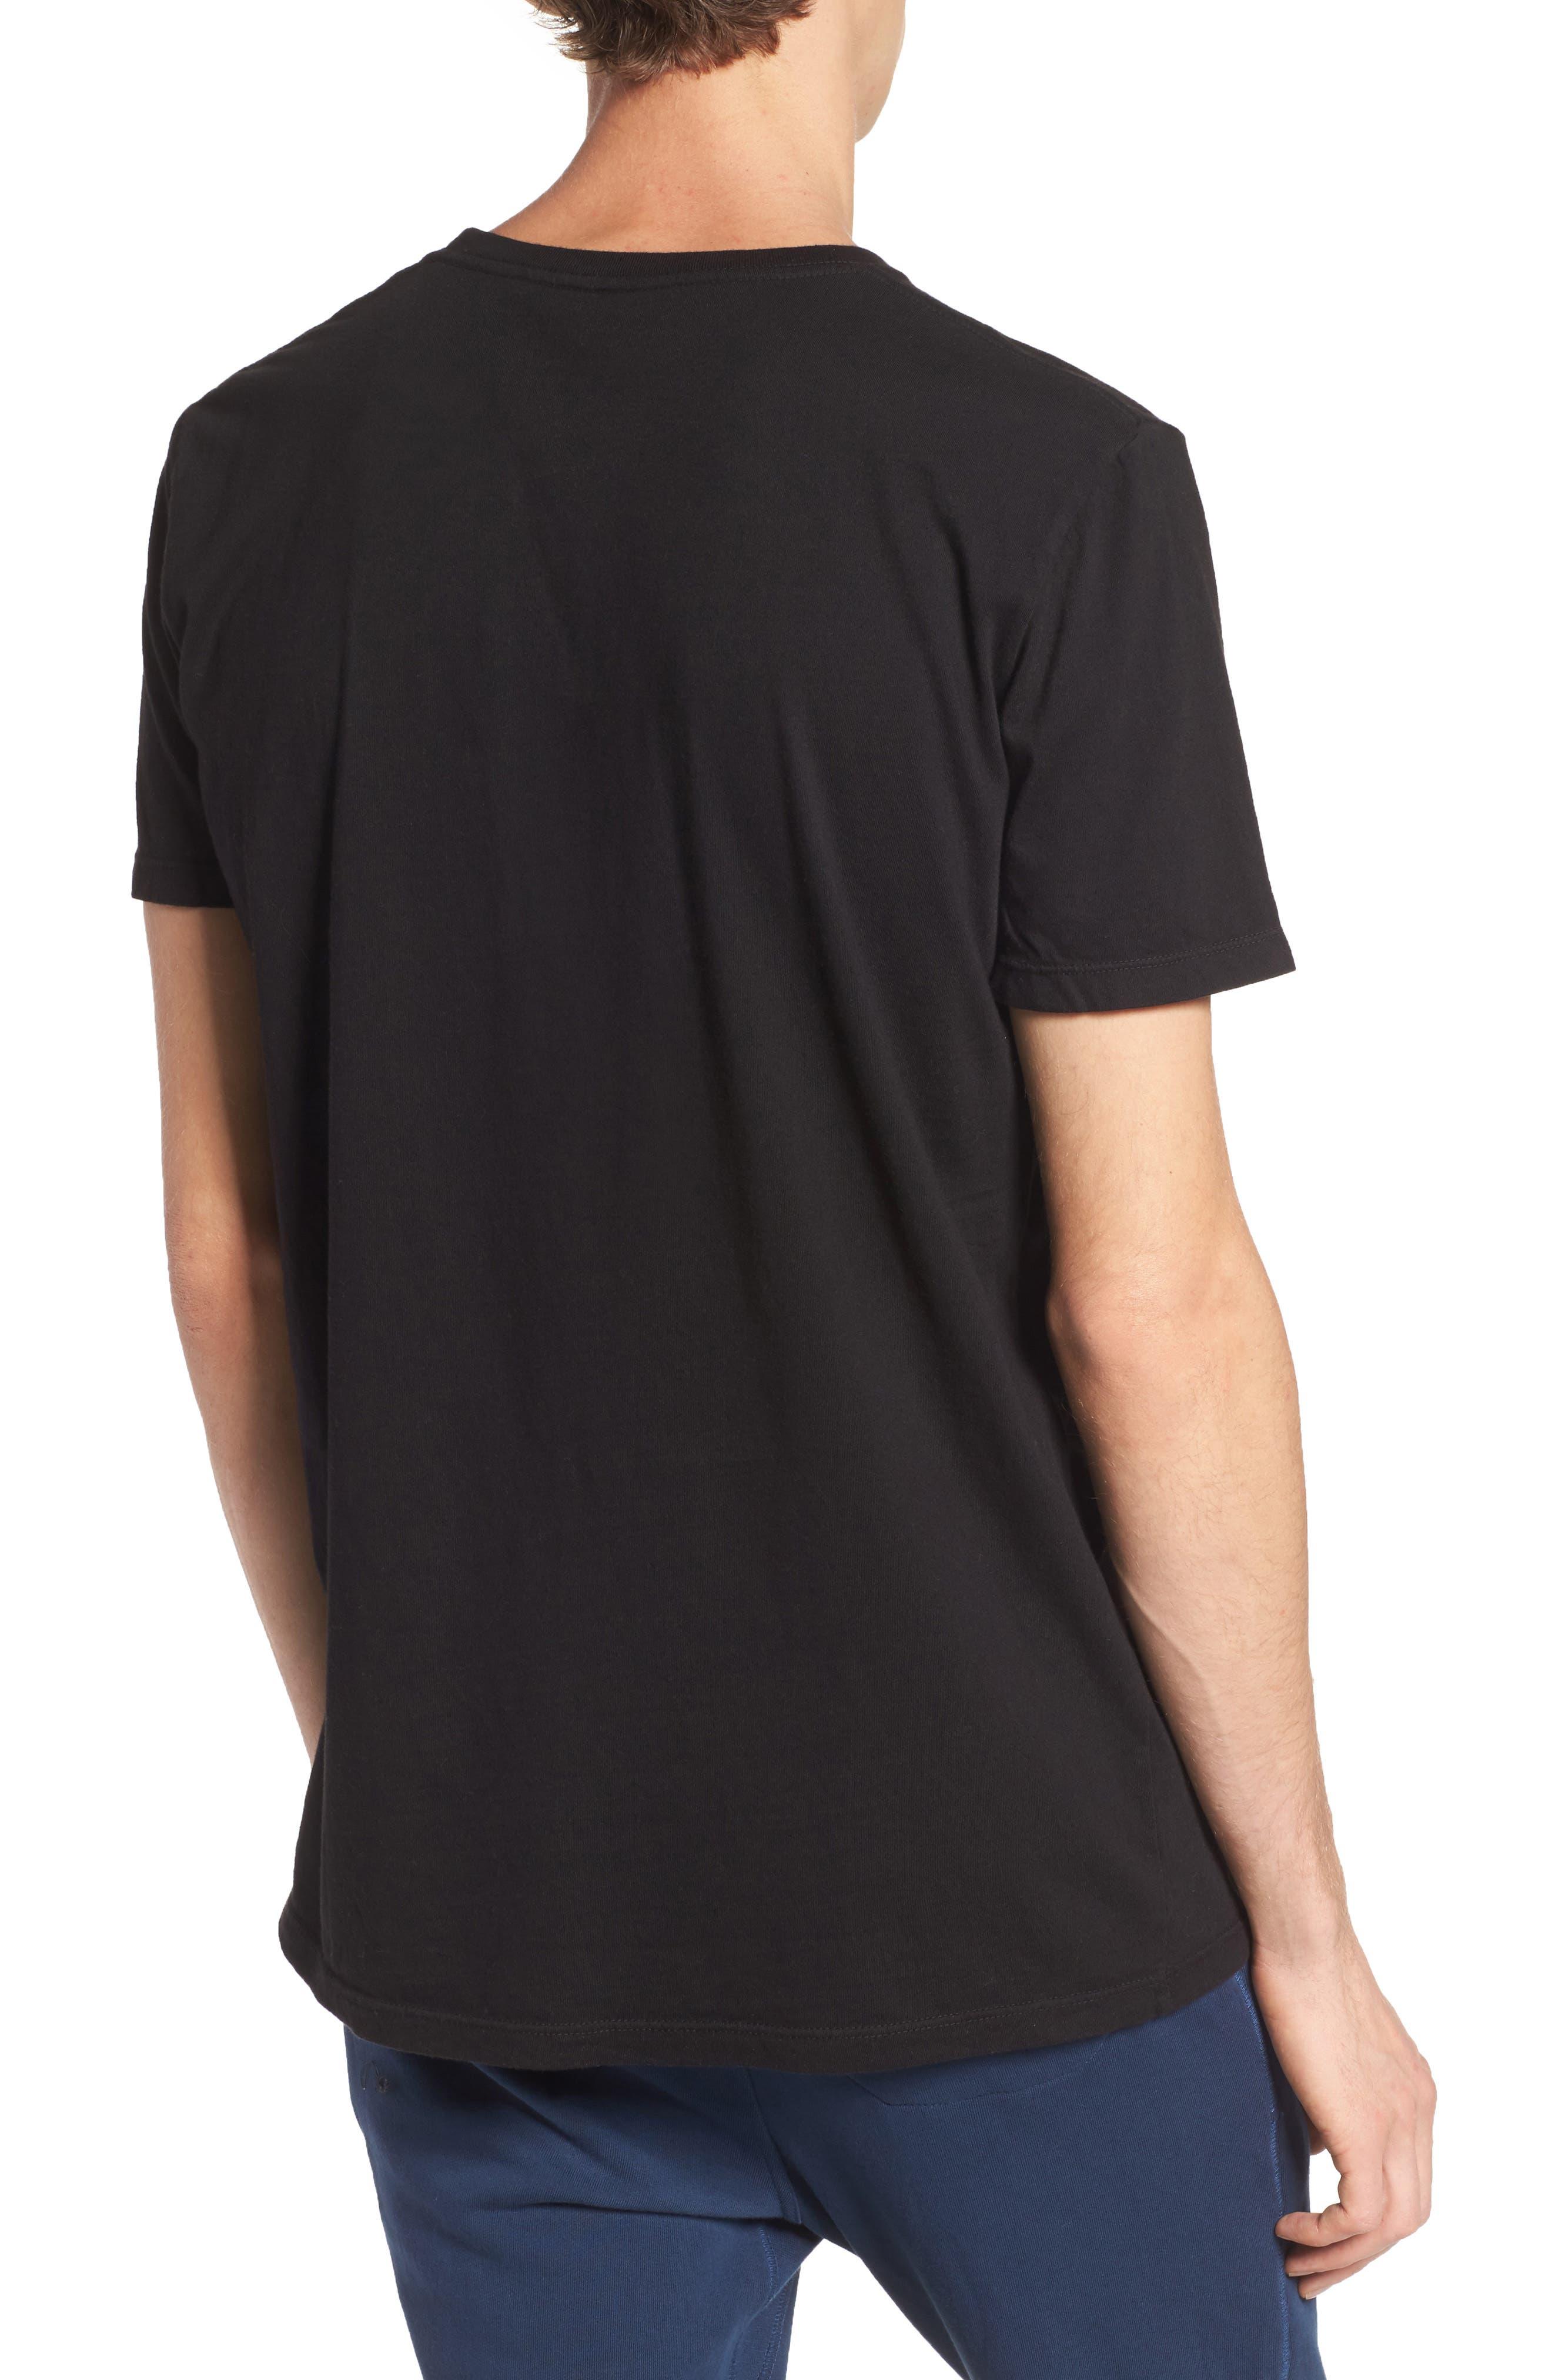 RICHER POORER, Lounge Pocket T-Shirt, Alternate thumbnail 2, color, BLACK